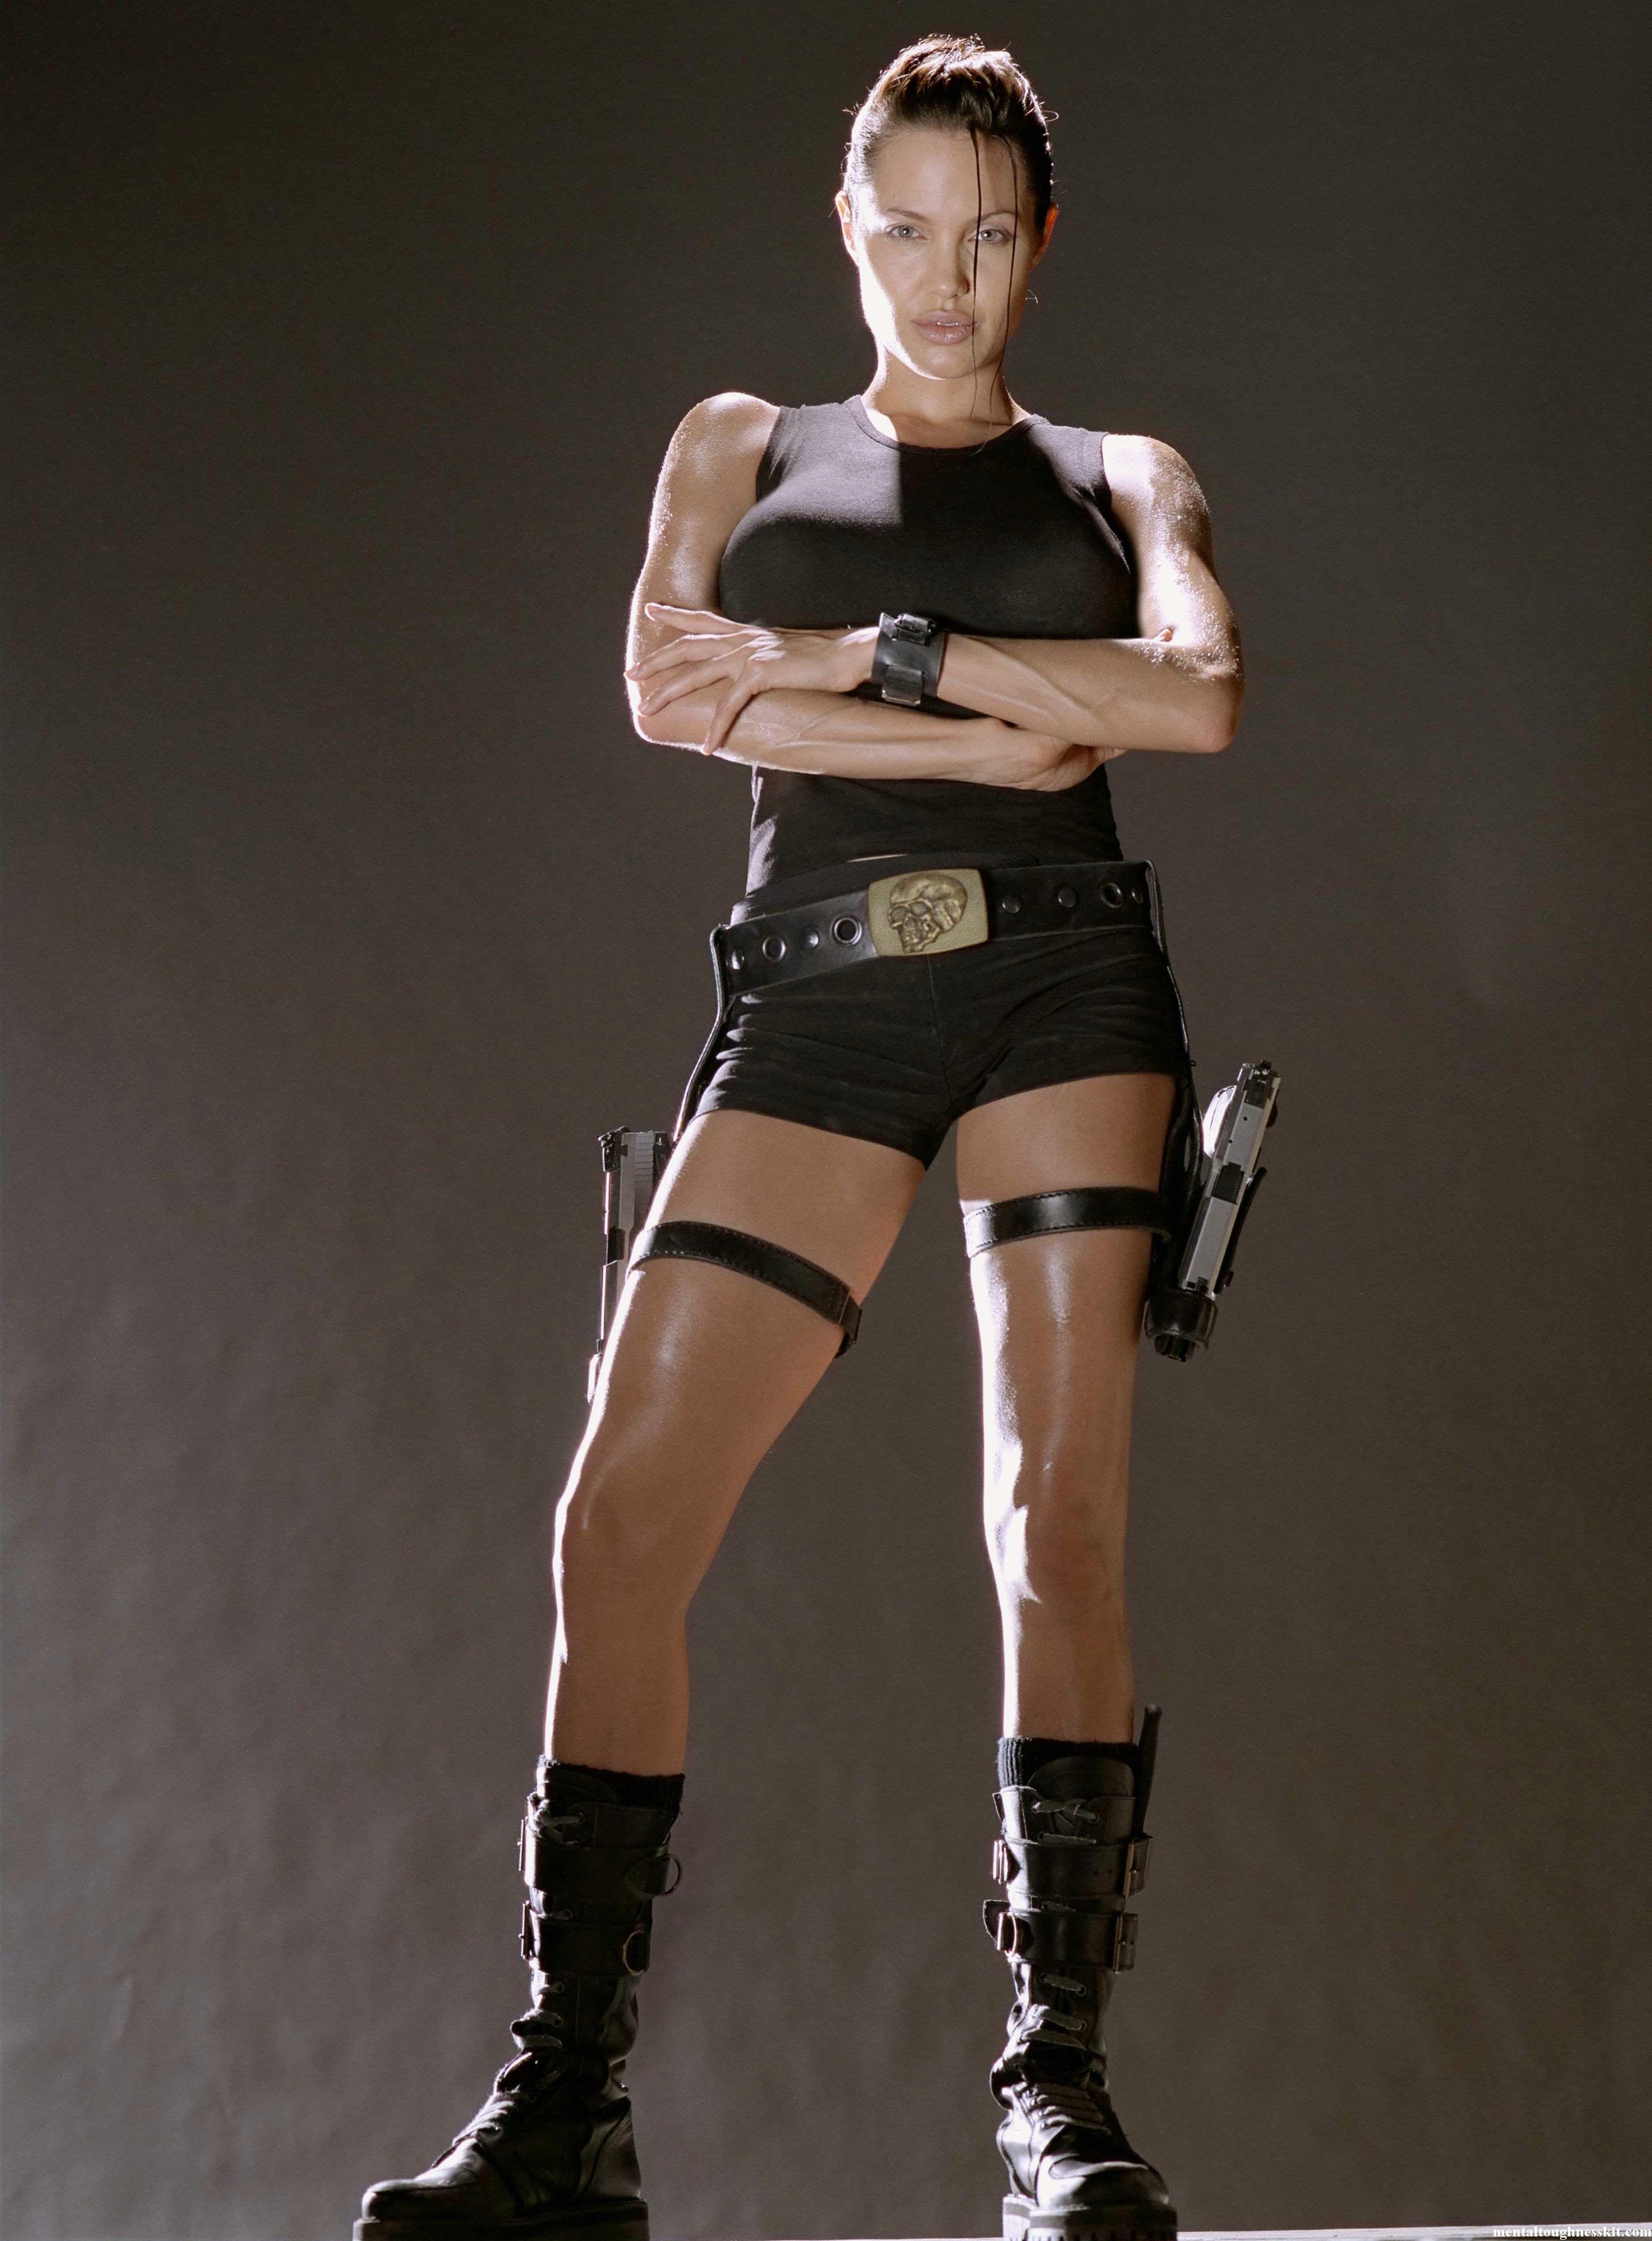 Lara Croft: Tomb Raider 3 (Angelina Jolie version)